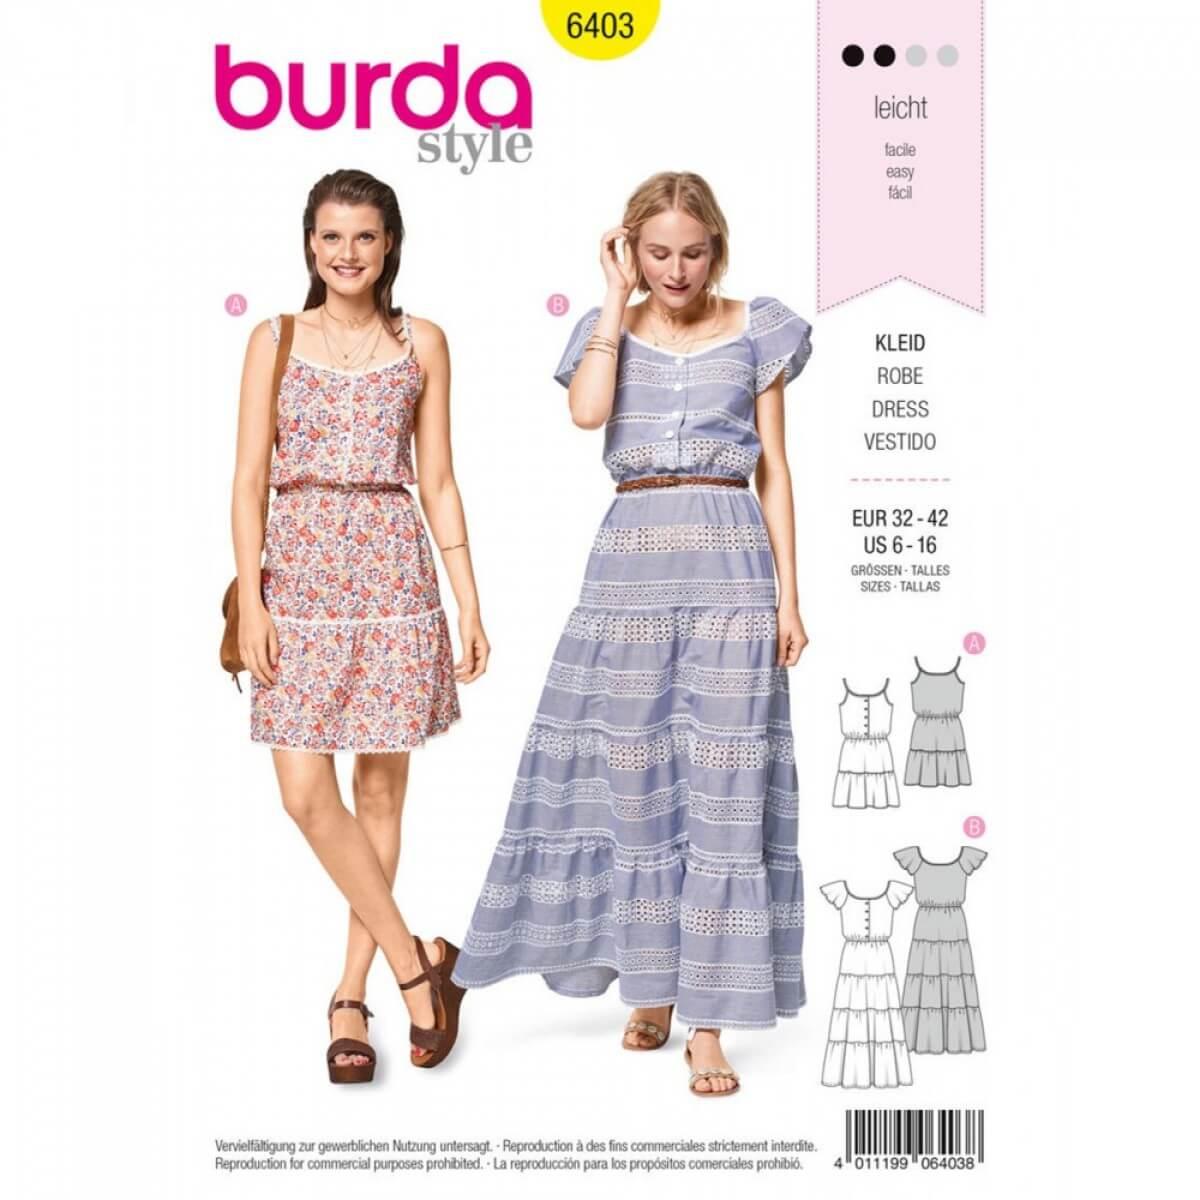 0ad80abe3f867 Patron de robe femme, Burda 6403 - Mercerie Caréfil